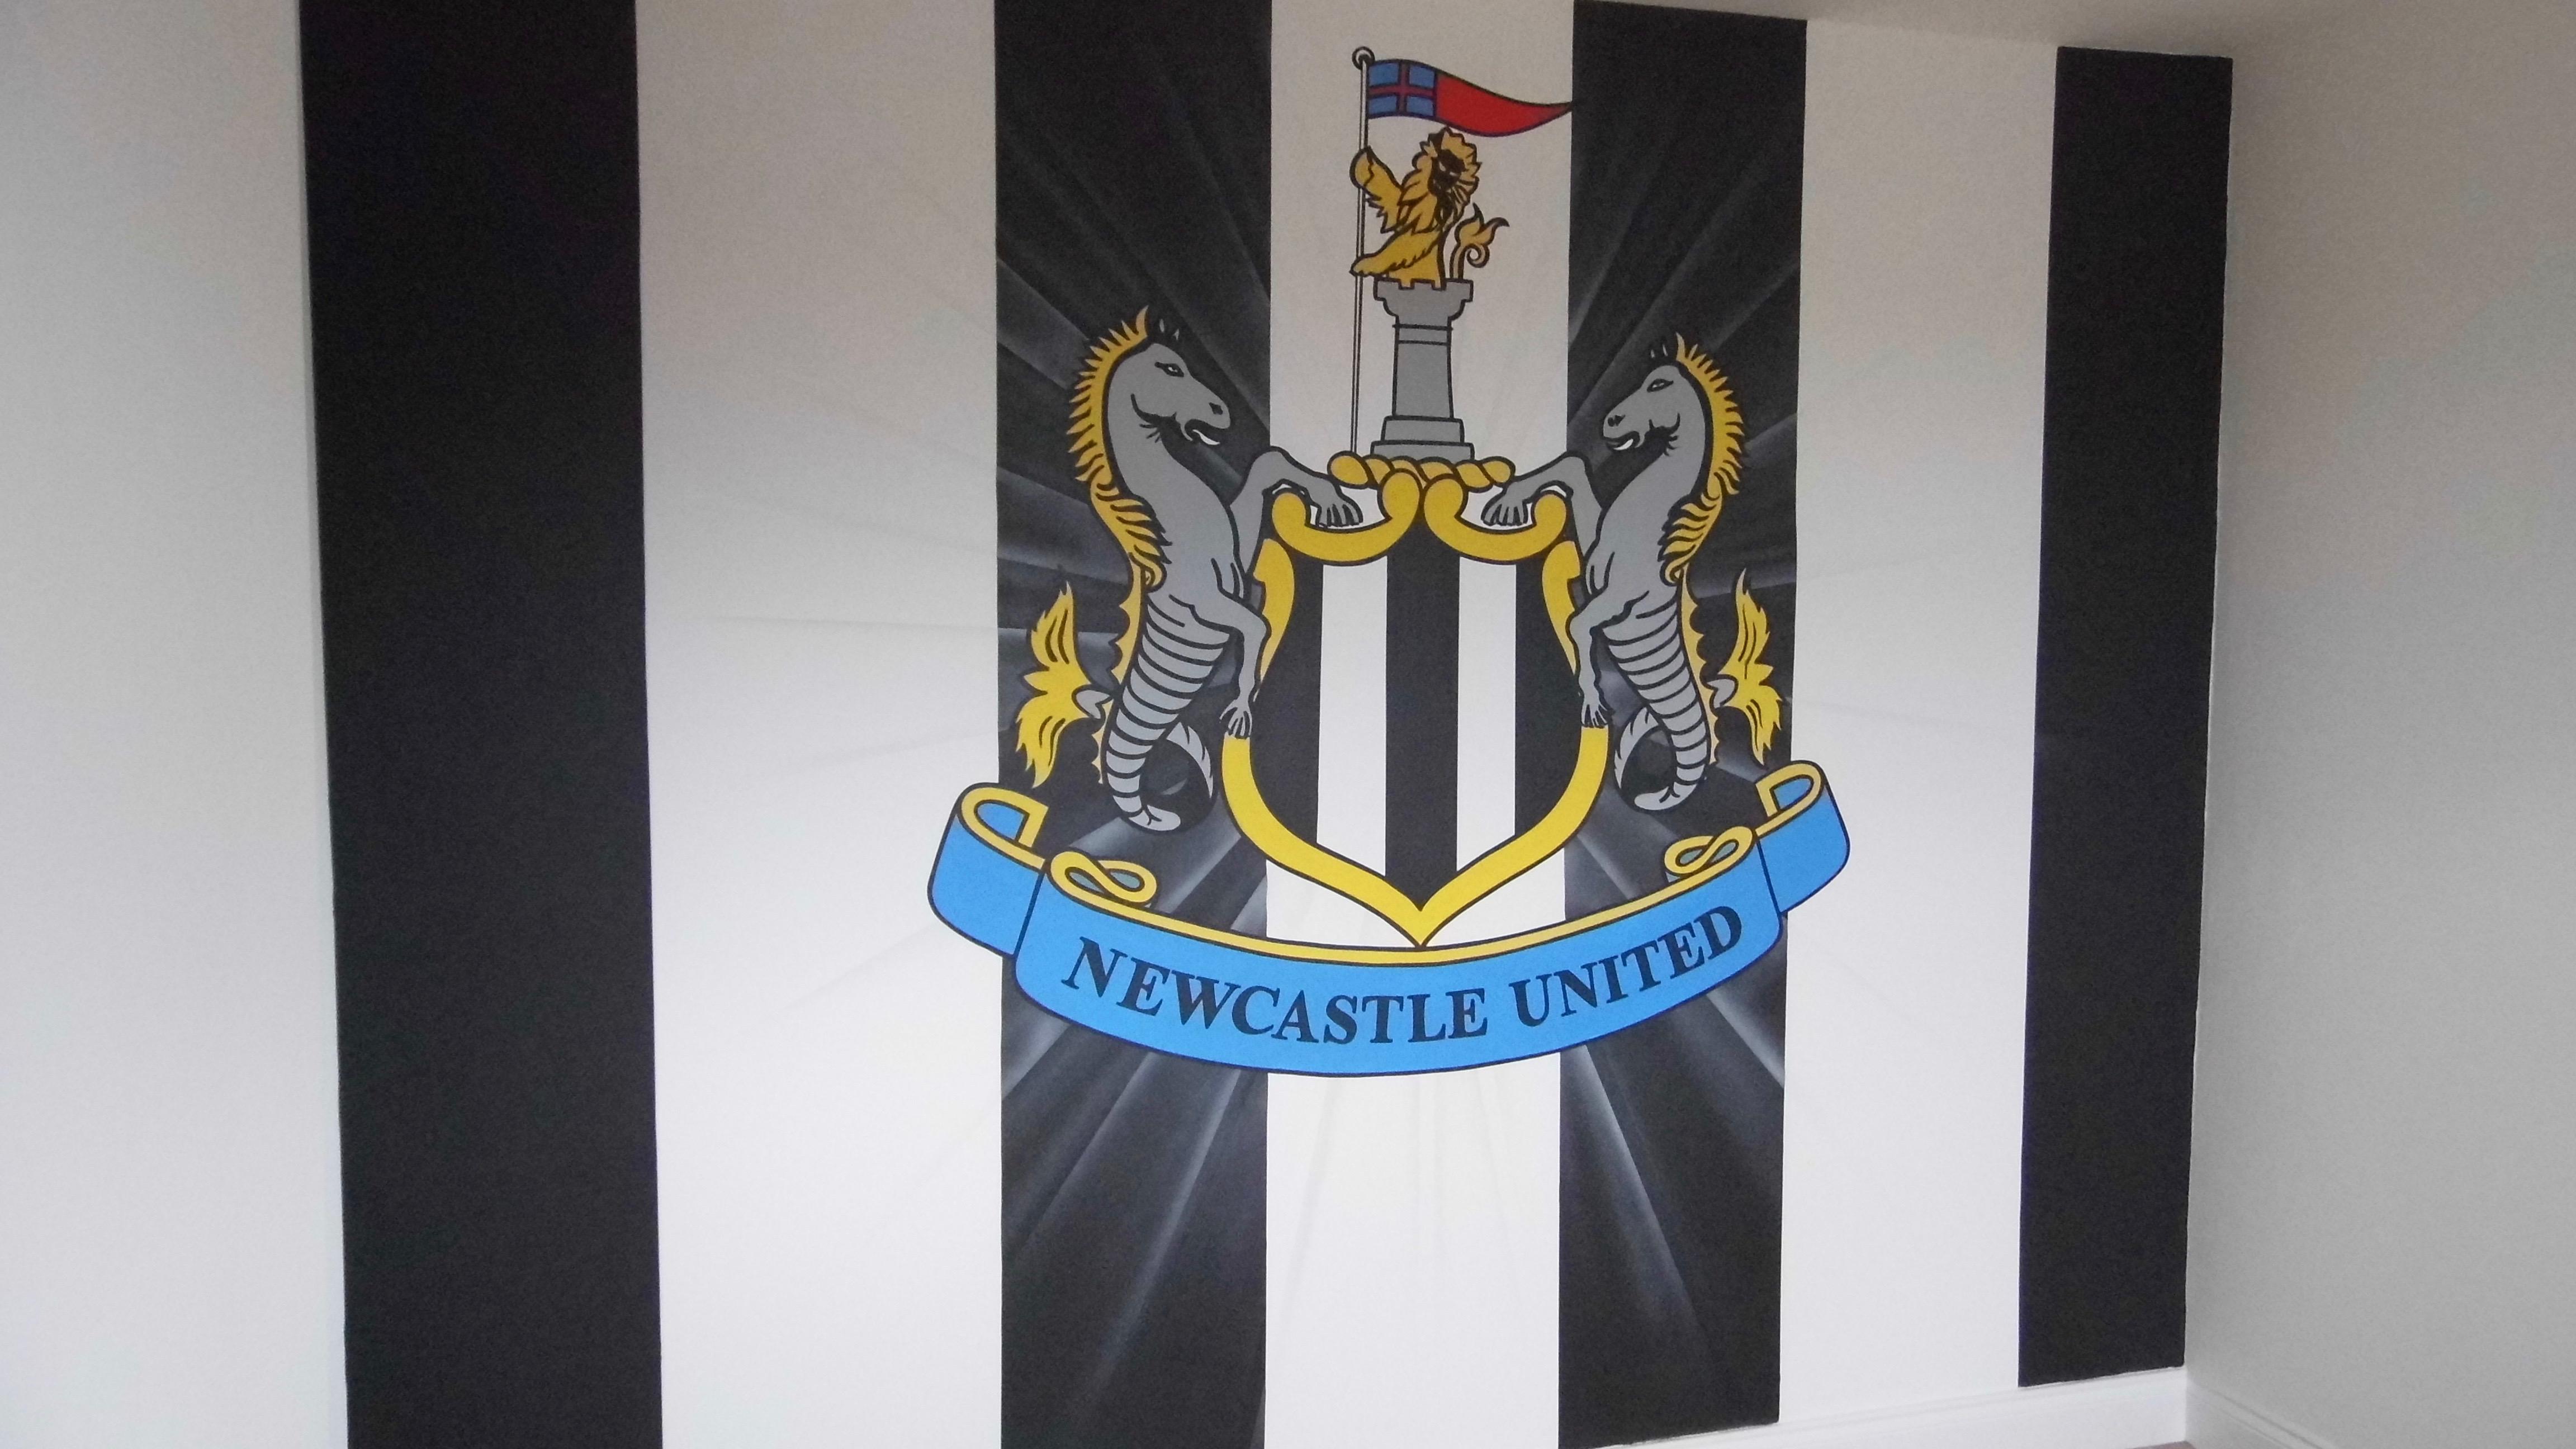 Newcastle NUFC Crest